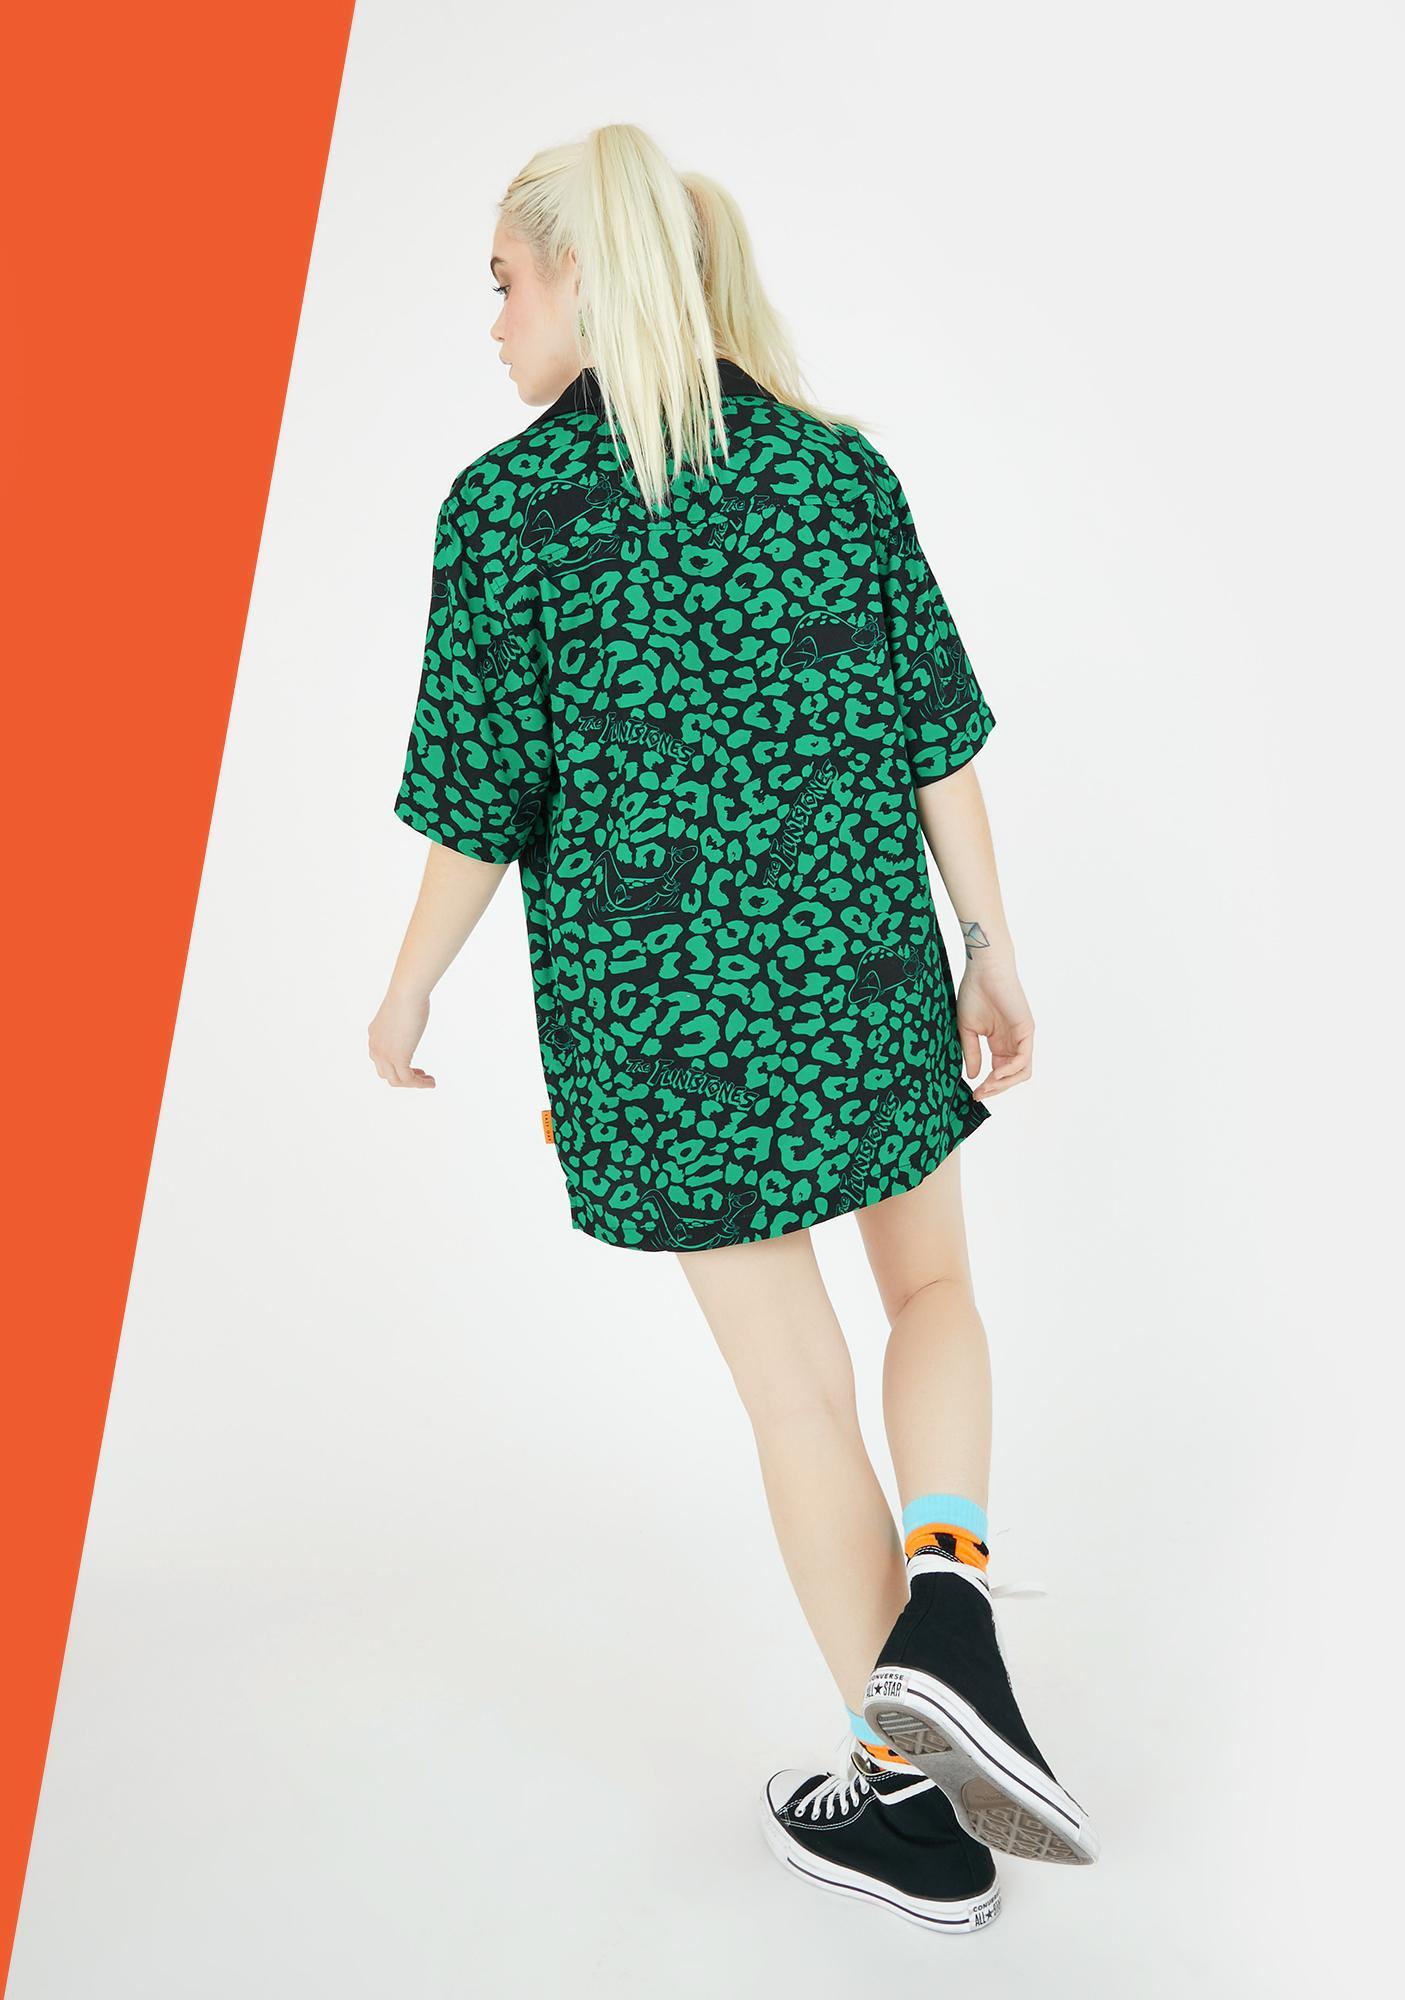 Lazy Oaf X Flintstones Dino Leopard Bowling Shirt